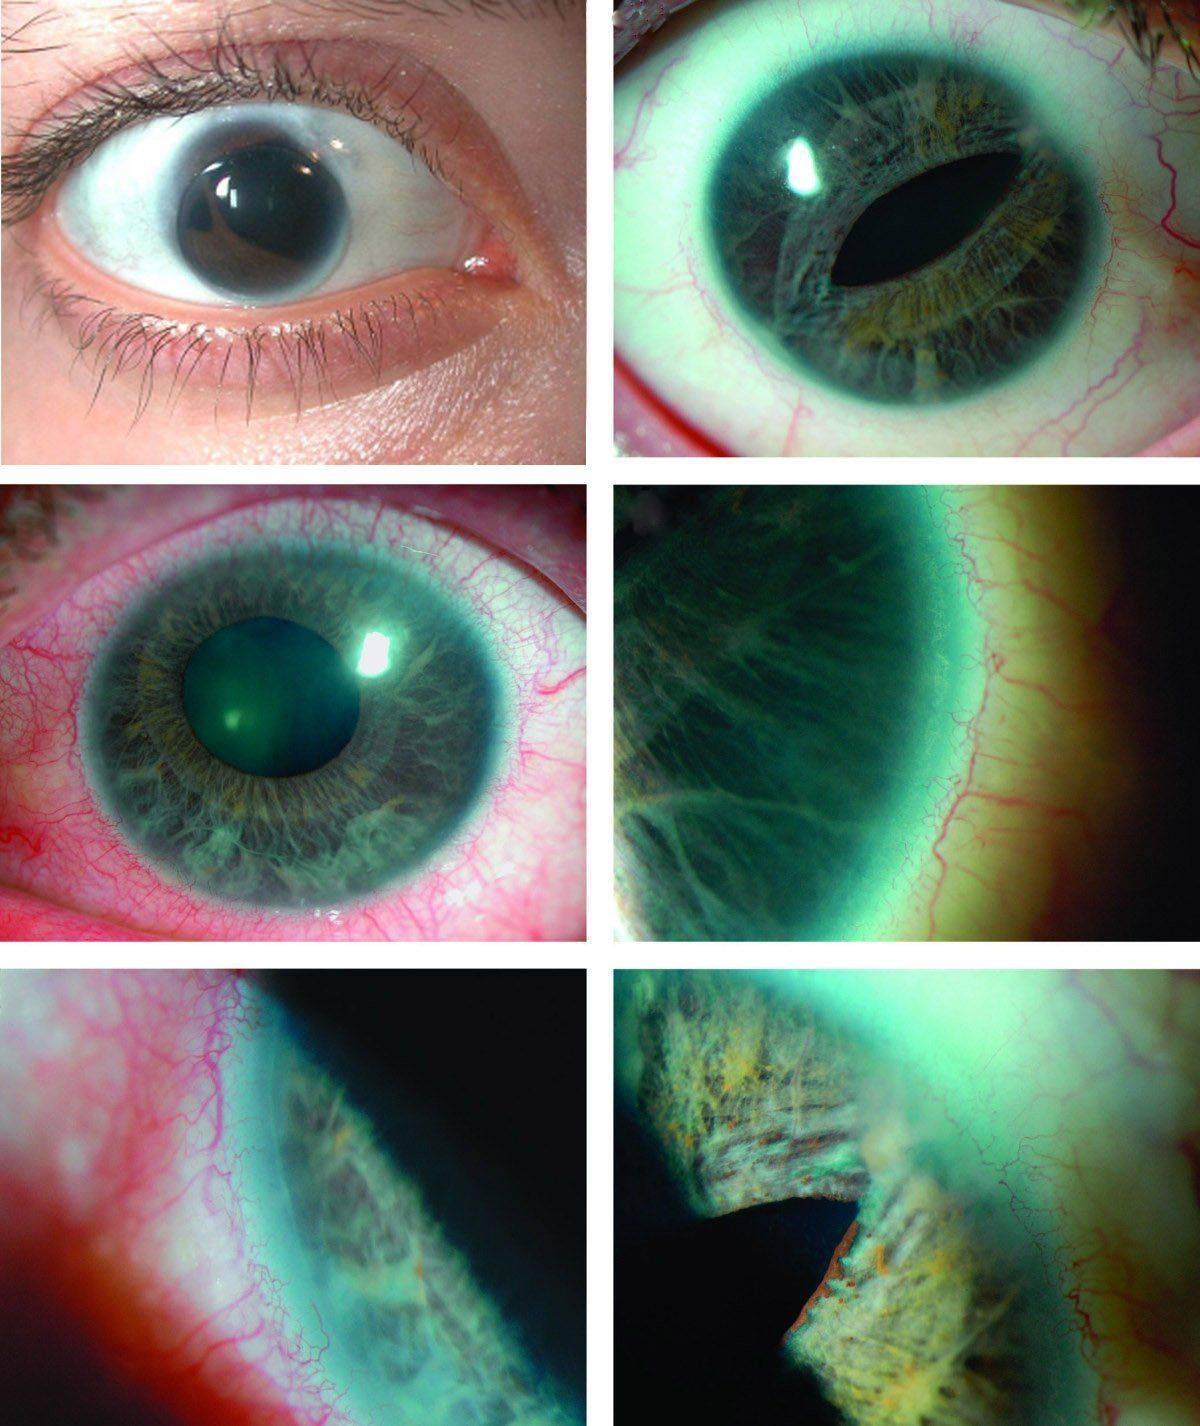 Состояние глаза при синдроме Аксенфельда